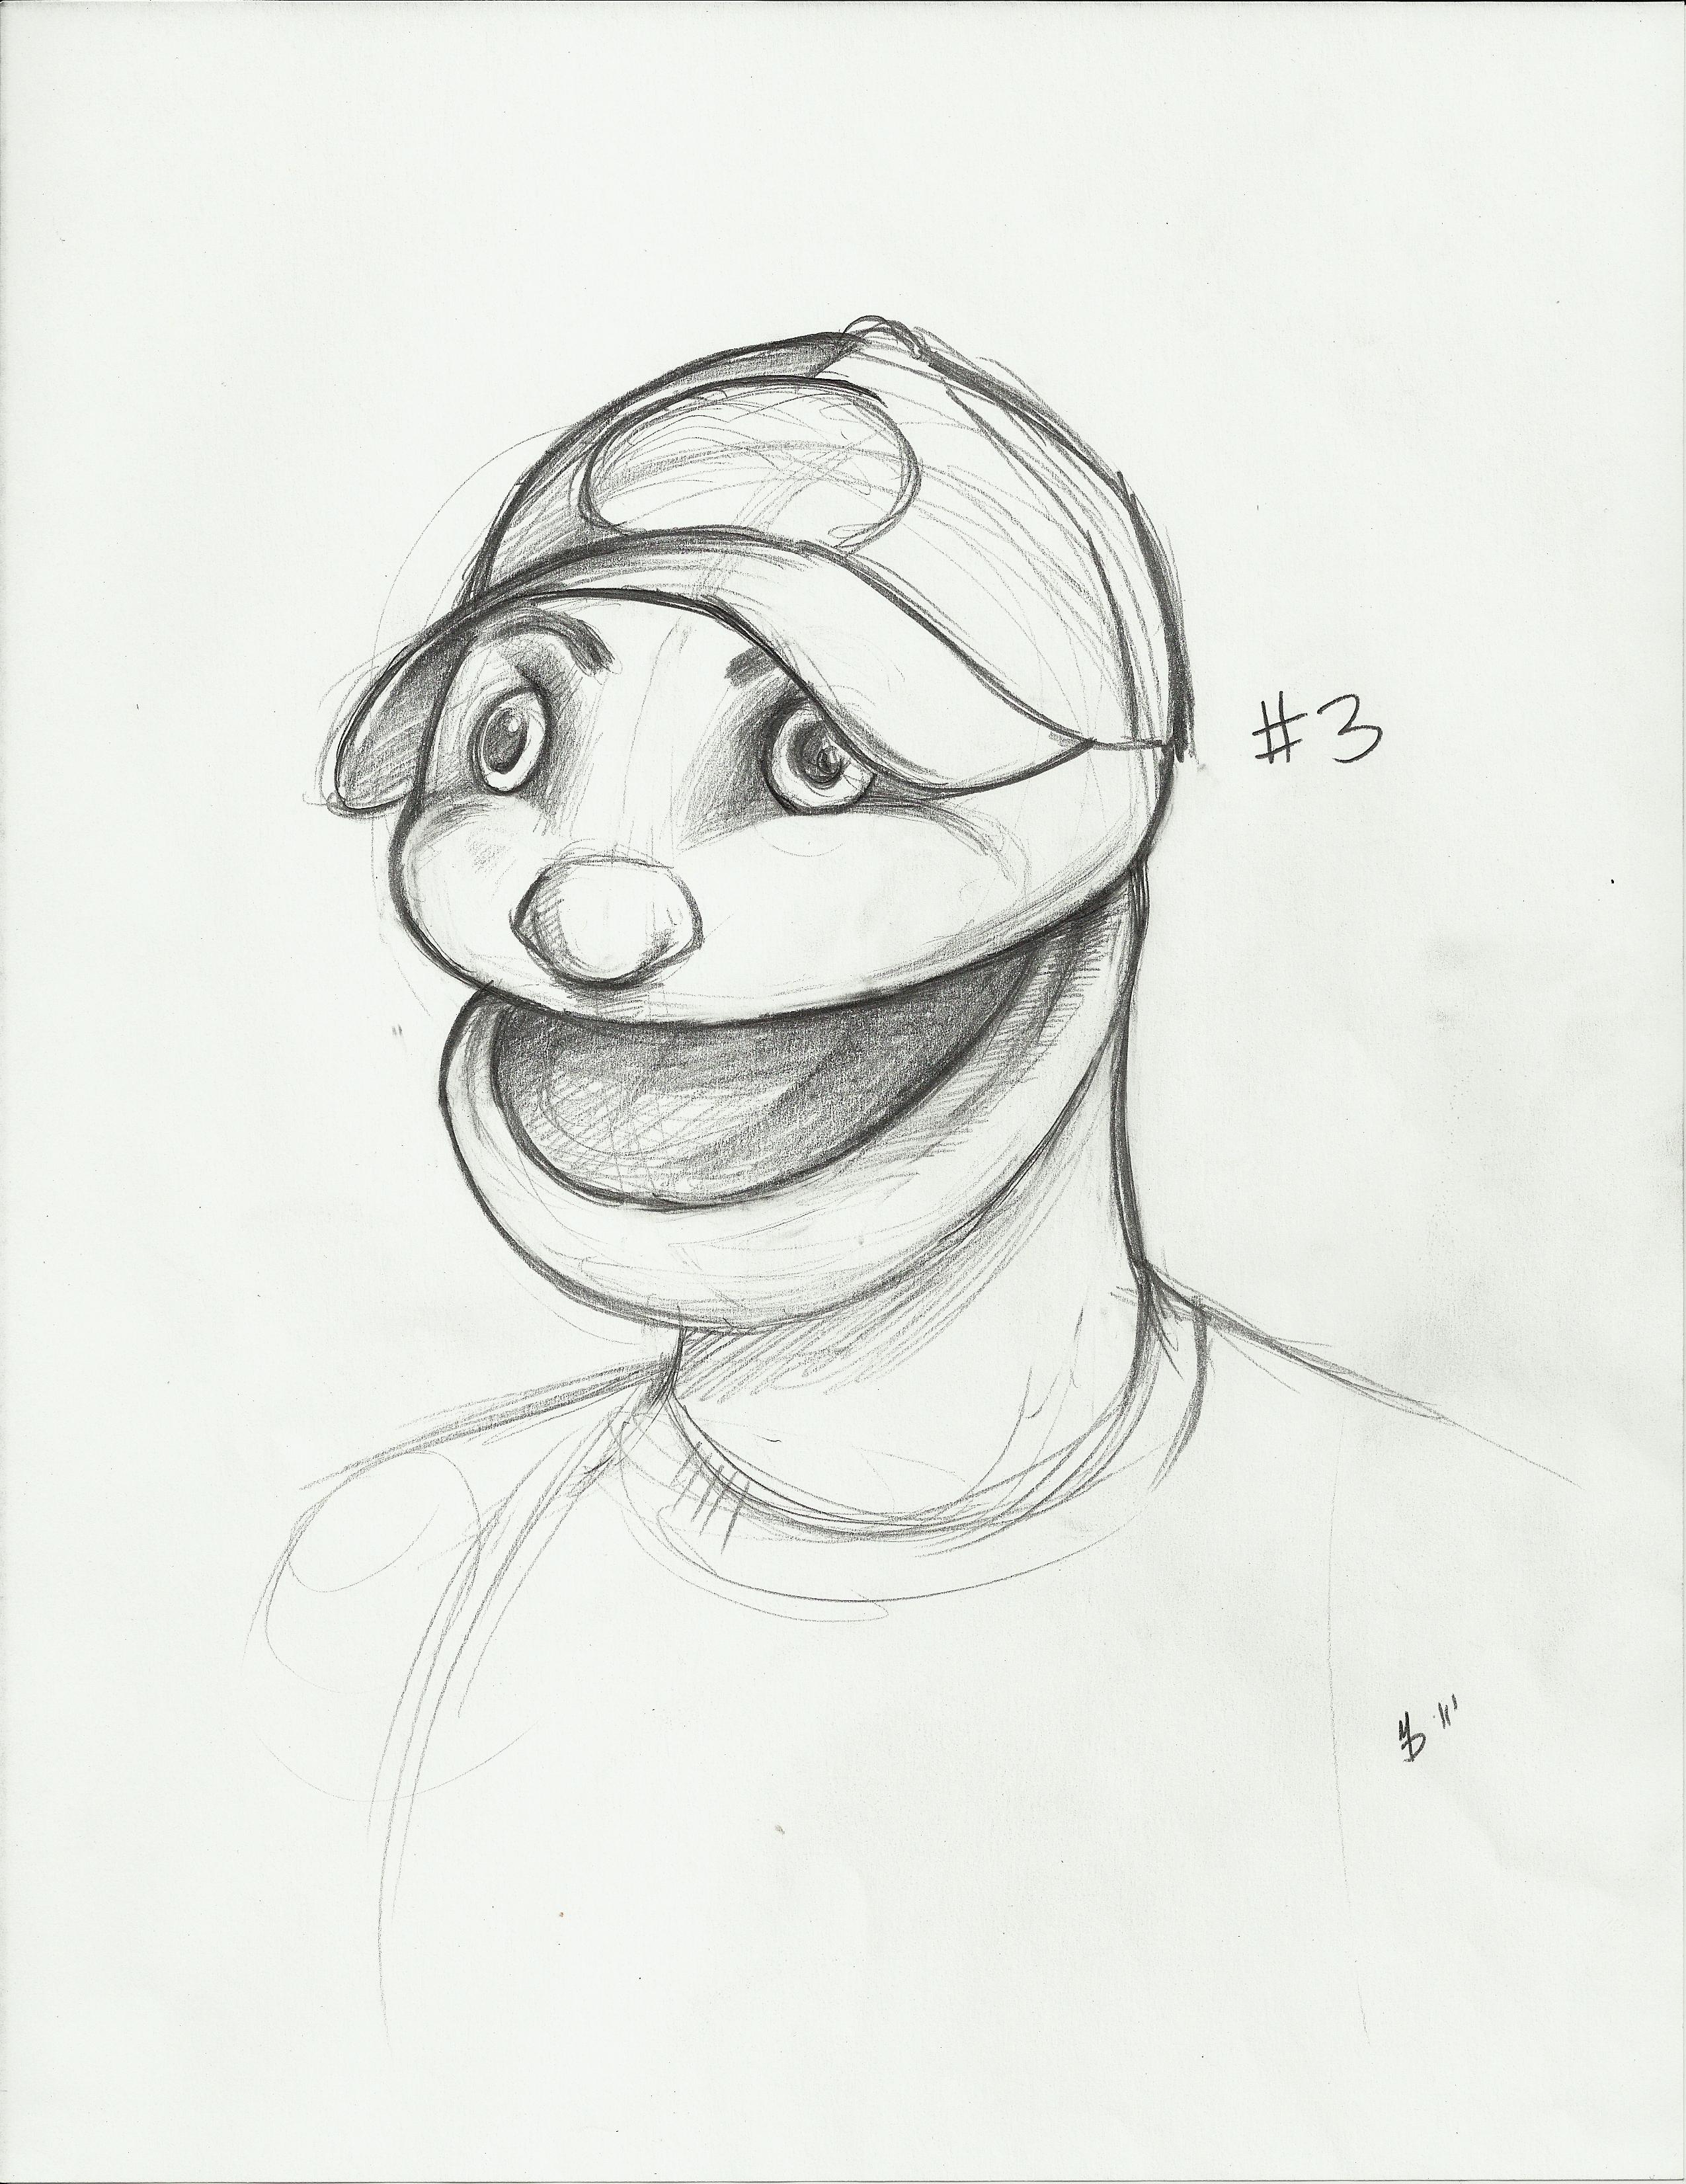 BobPuppet3